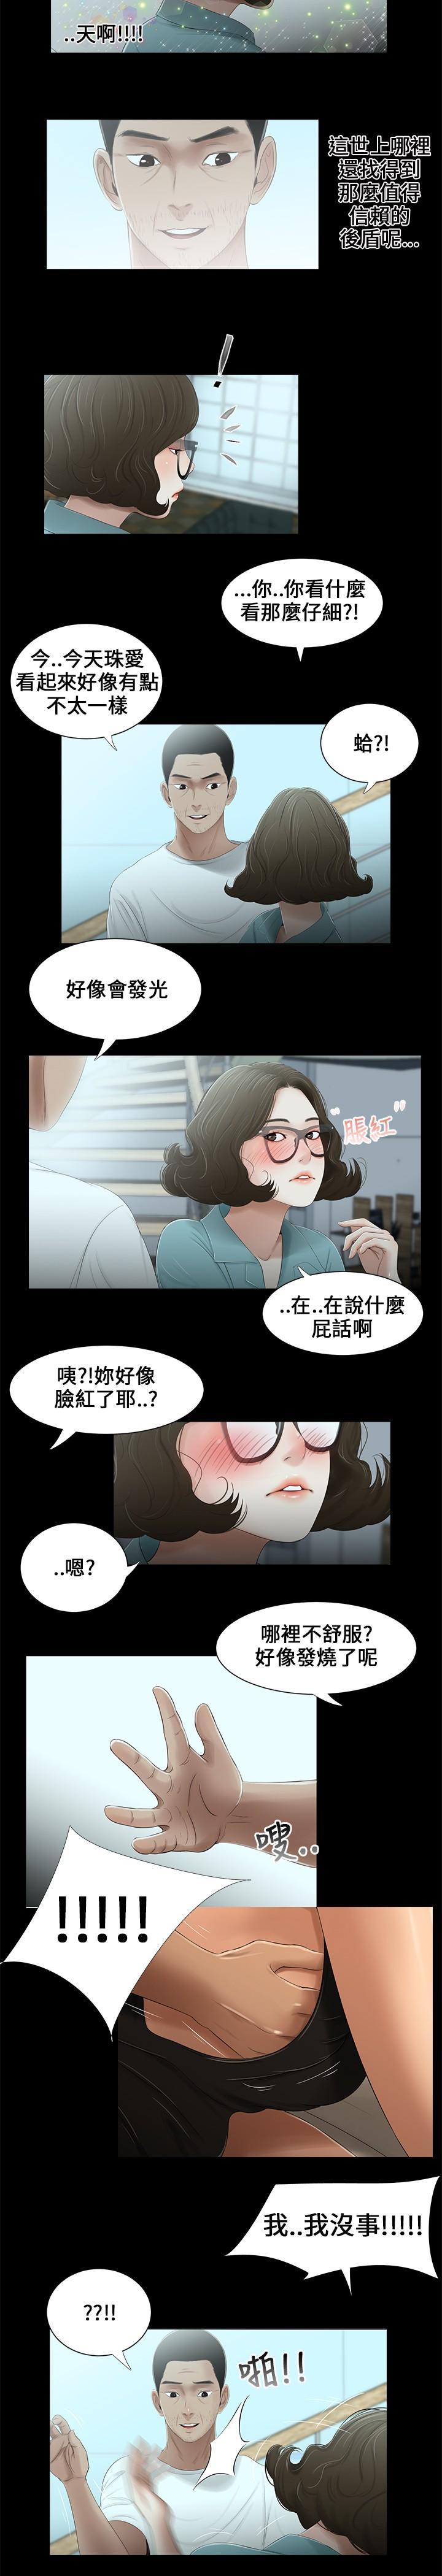 Three sisters 三姐妹Ch.13~19 (Chinese)中文 56